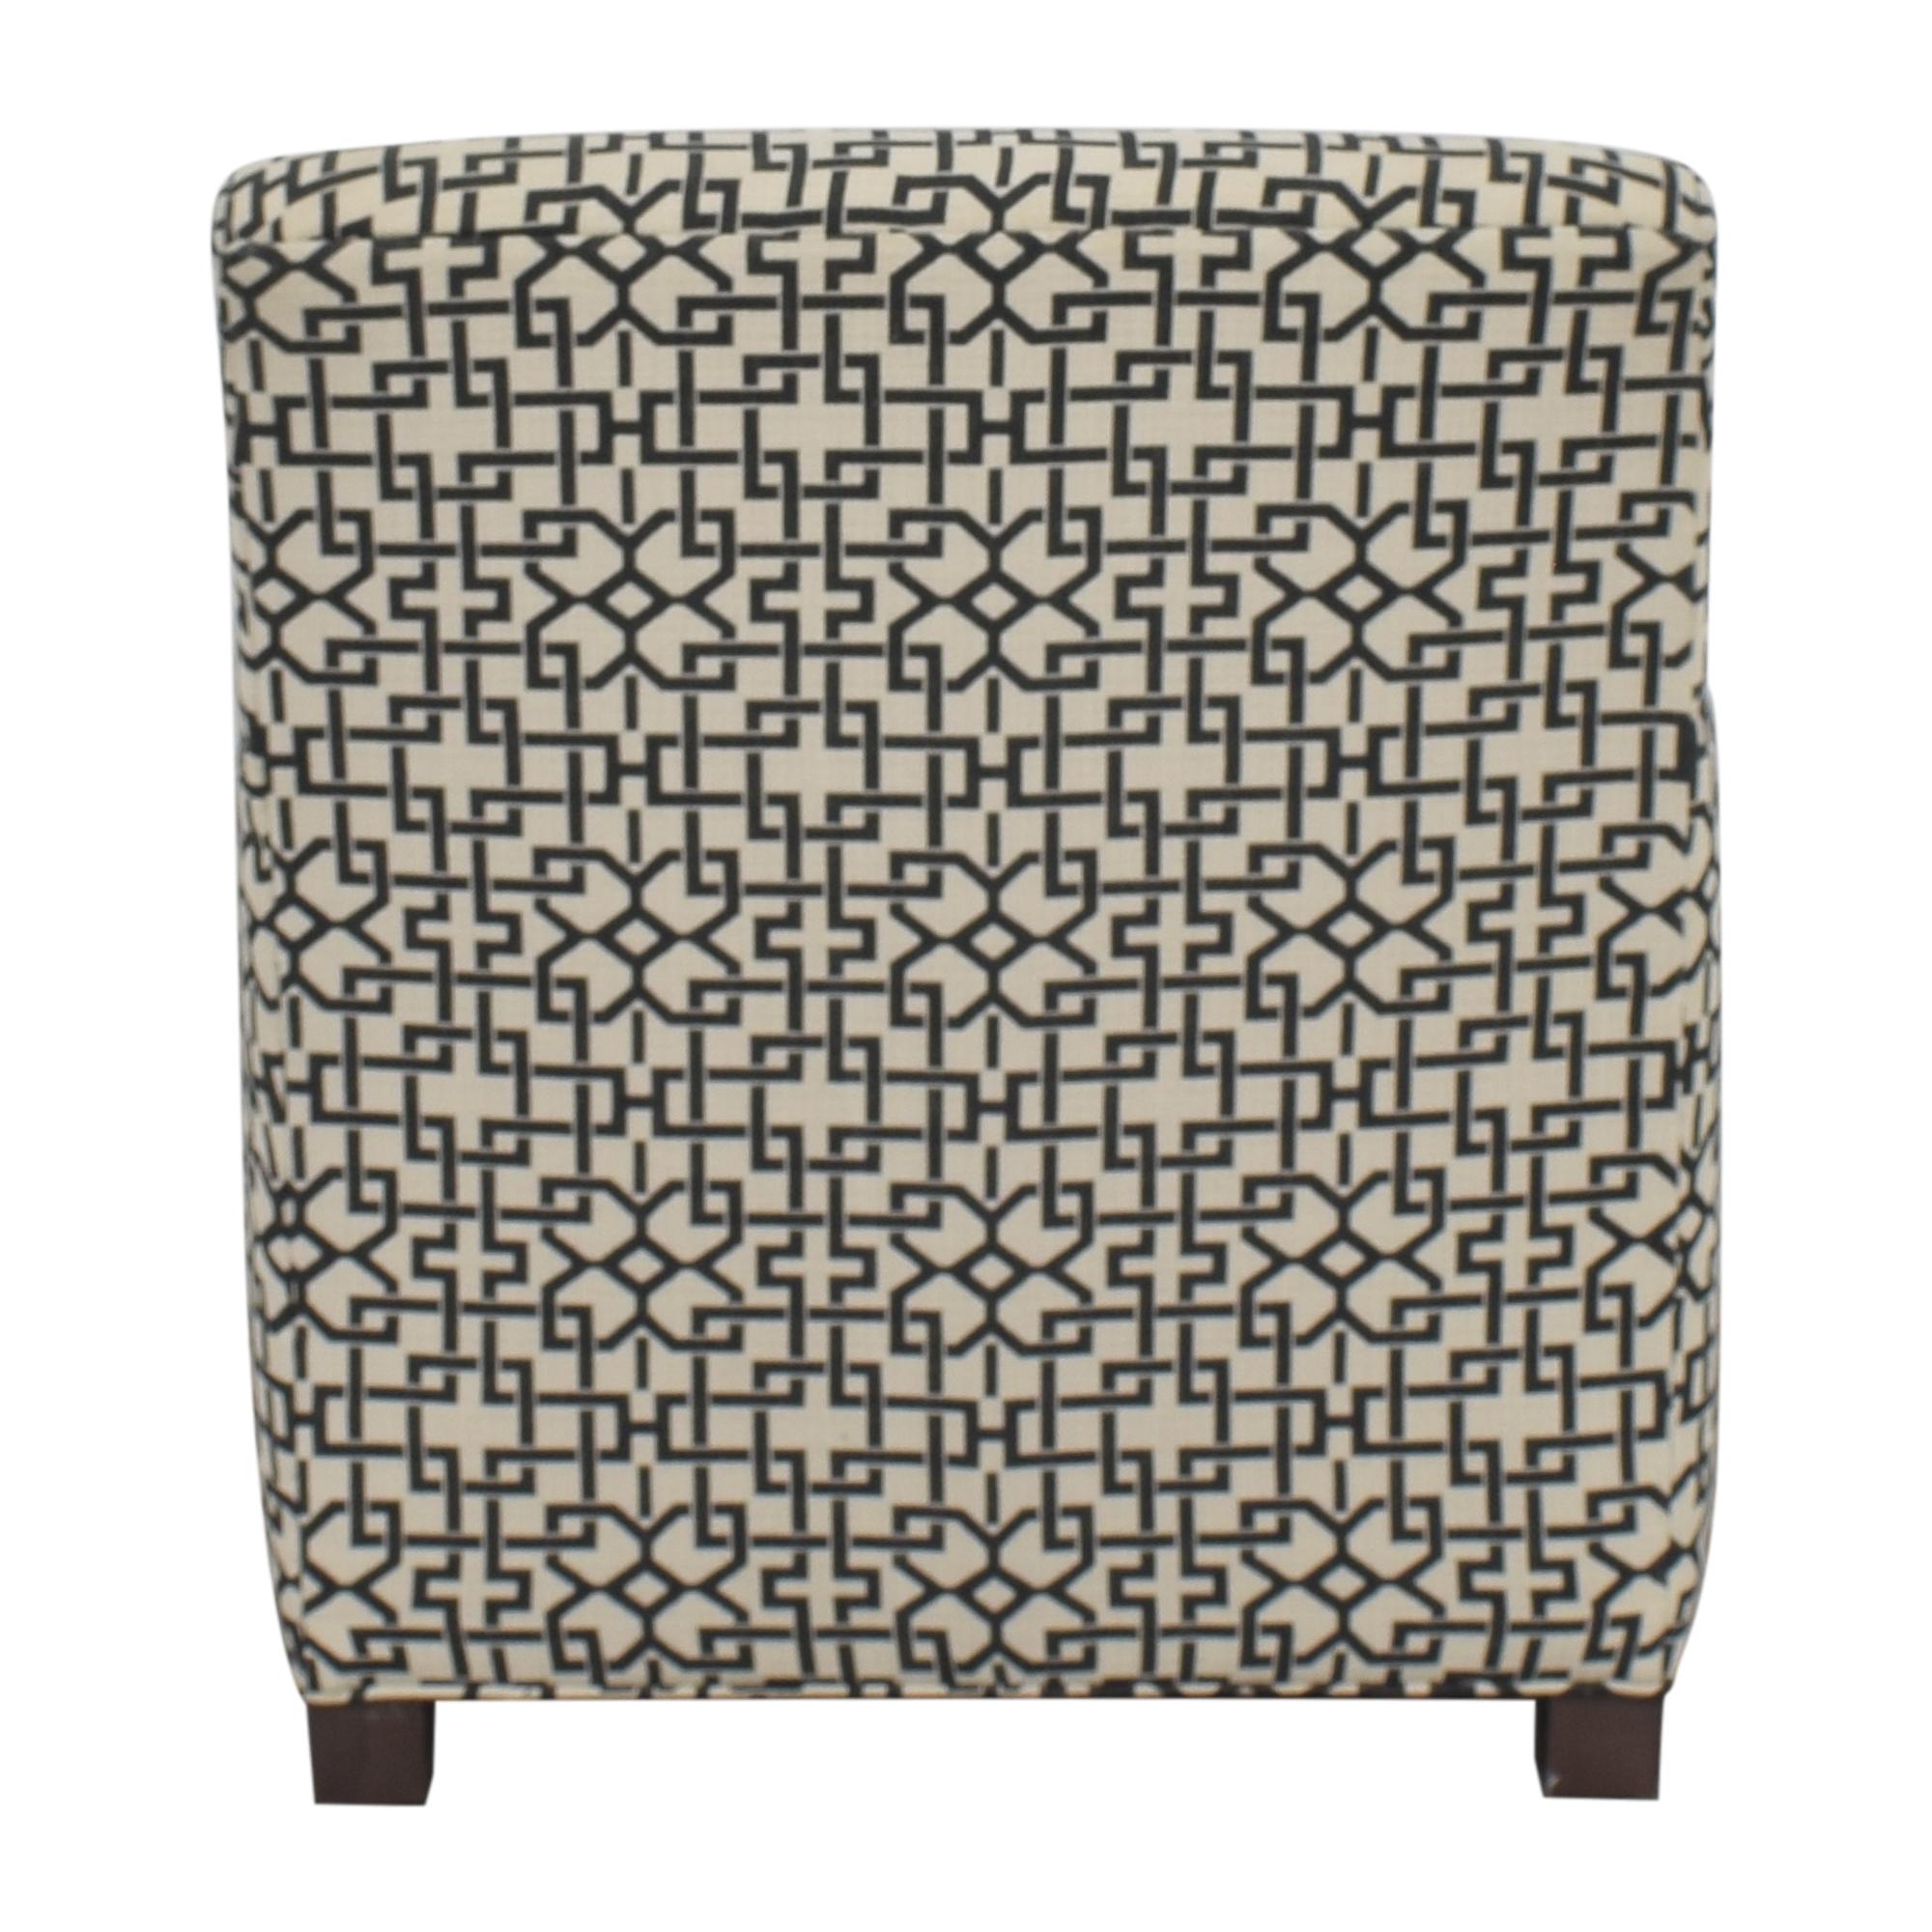 Crate & Barrel Crate & Barrel Geometric Club Chair Accent Chairs